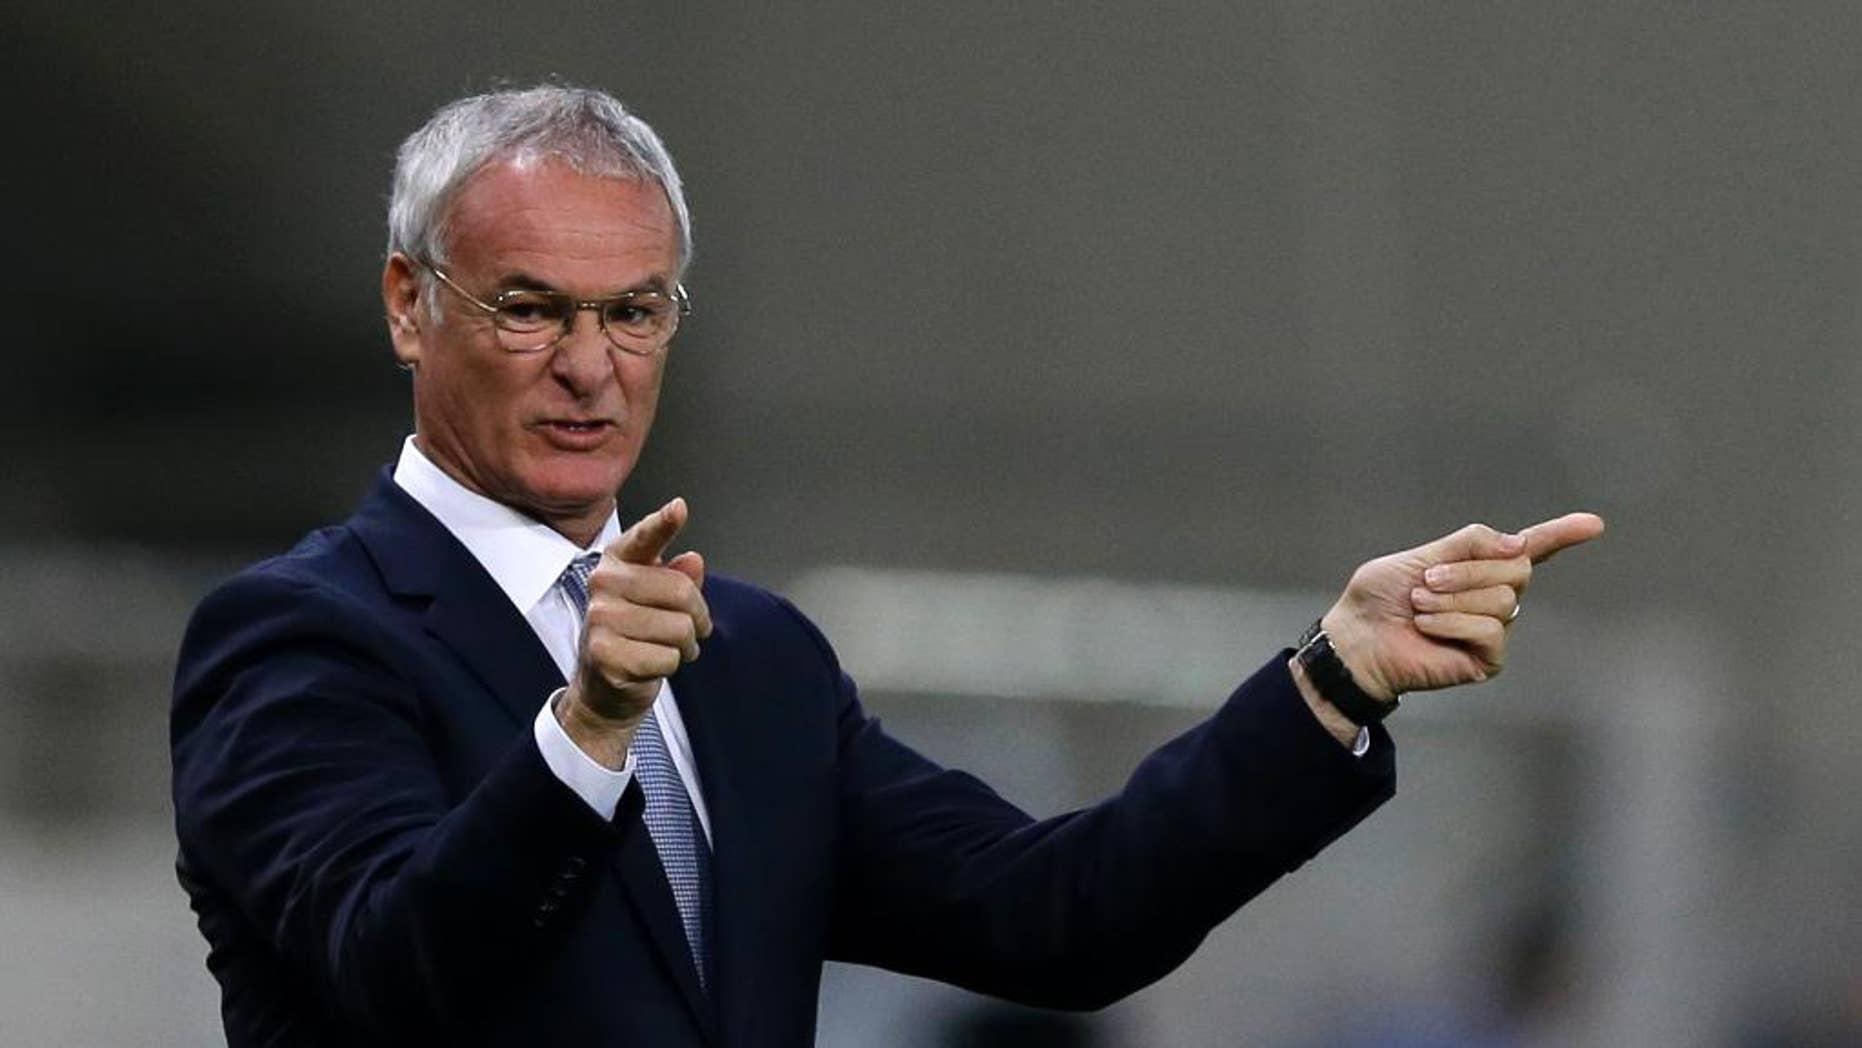 Greece's coach Claudio Ranieri of Italy reacts during the Group F Euro 2016 qualifying soccer match between Greece and Faroe Islands, at the Georgios Karaiskakis stadium, in the port of Piraeus, near Athens on Friday, Nov. 14, 2014. (AP Photo/Thanassis Stavrakis)